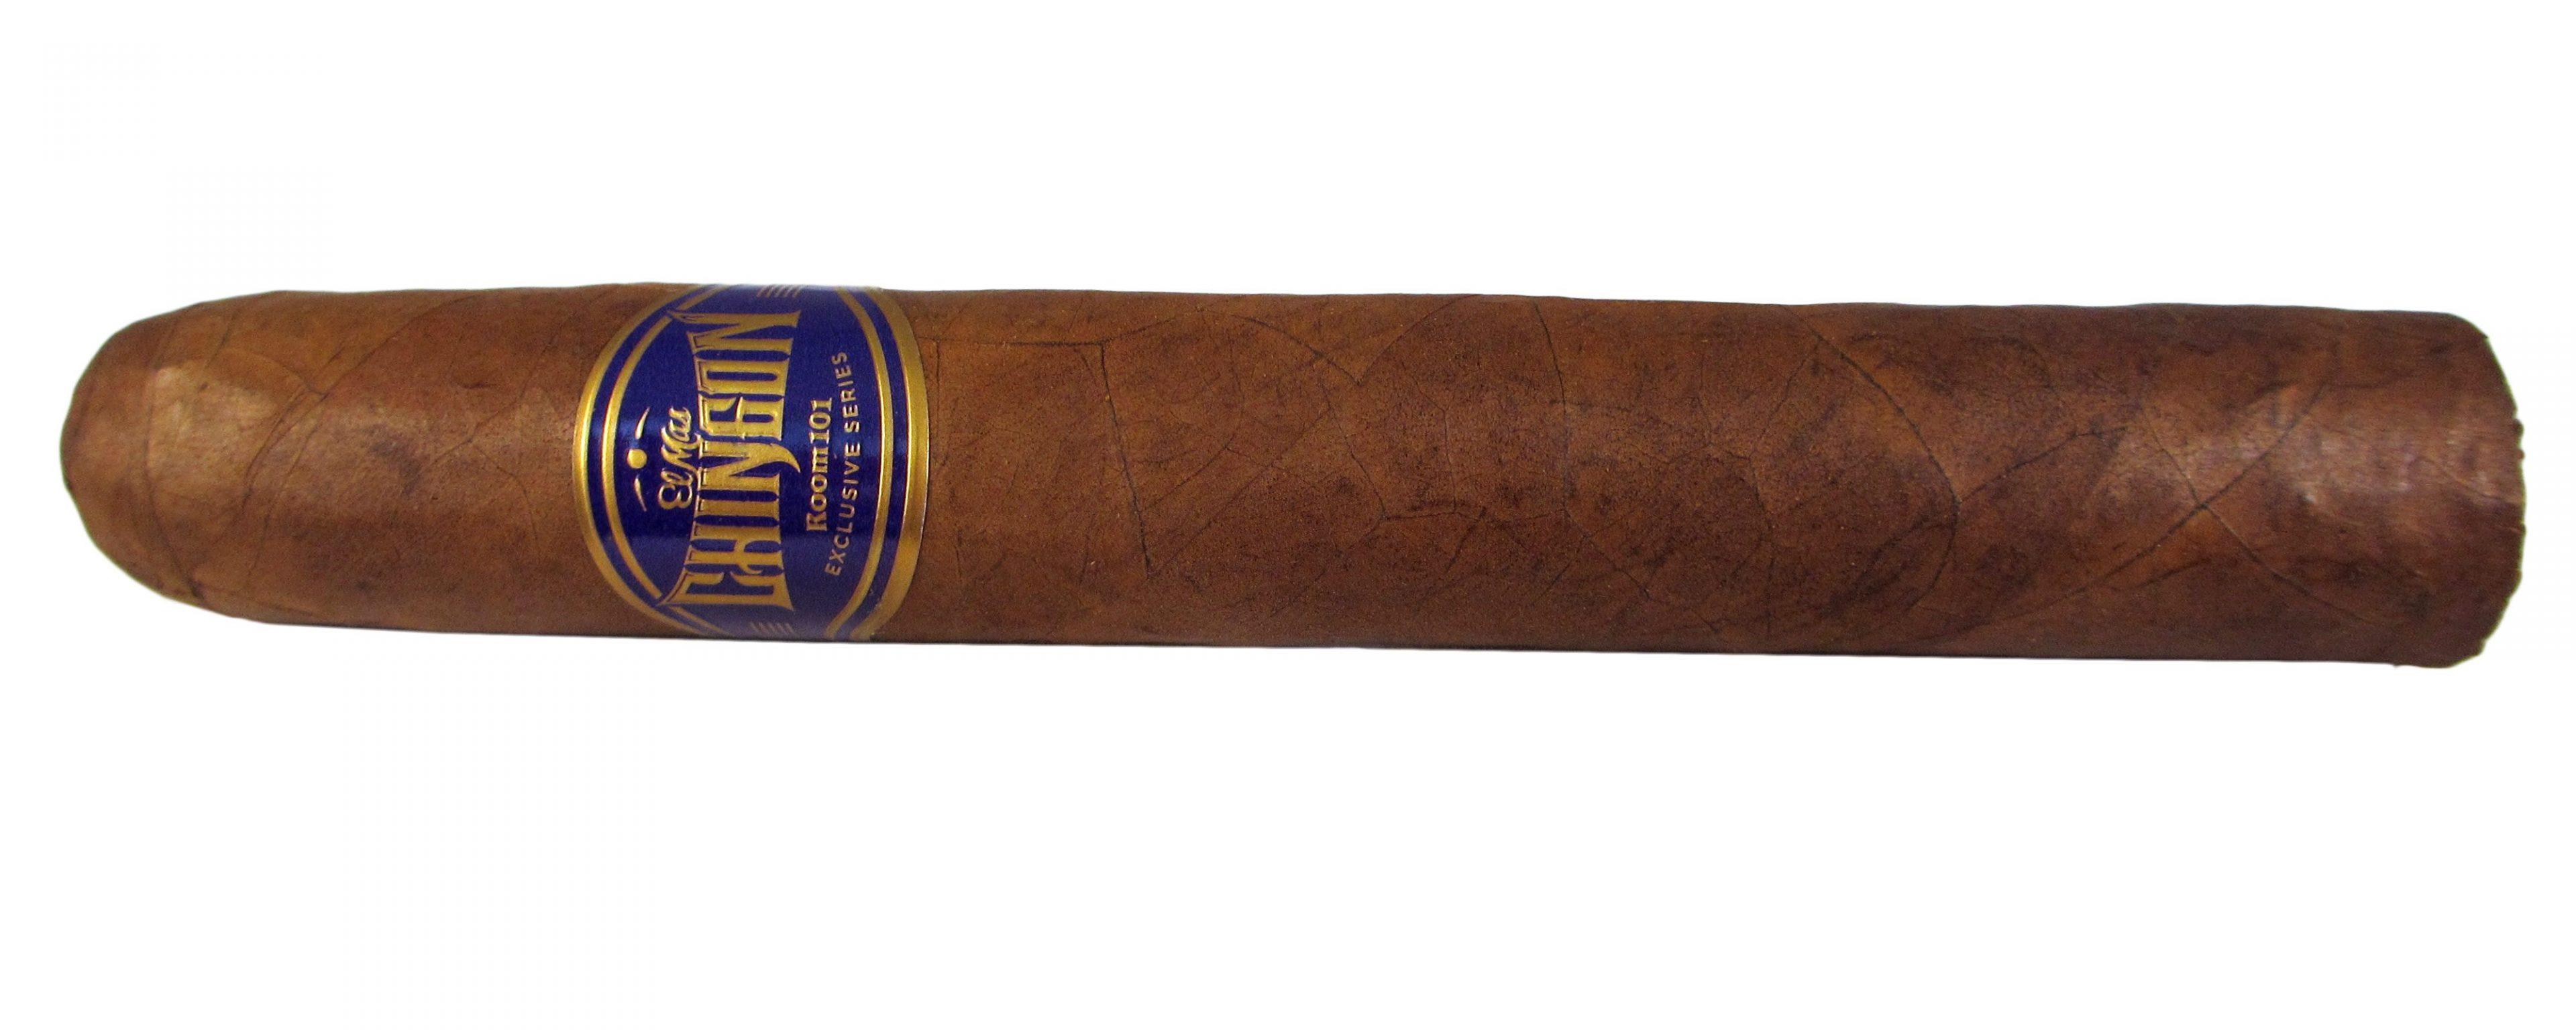 Blind Cigar Review: Room101 | El Mas Chingon No. 3